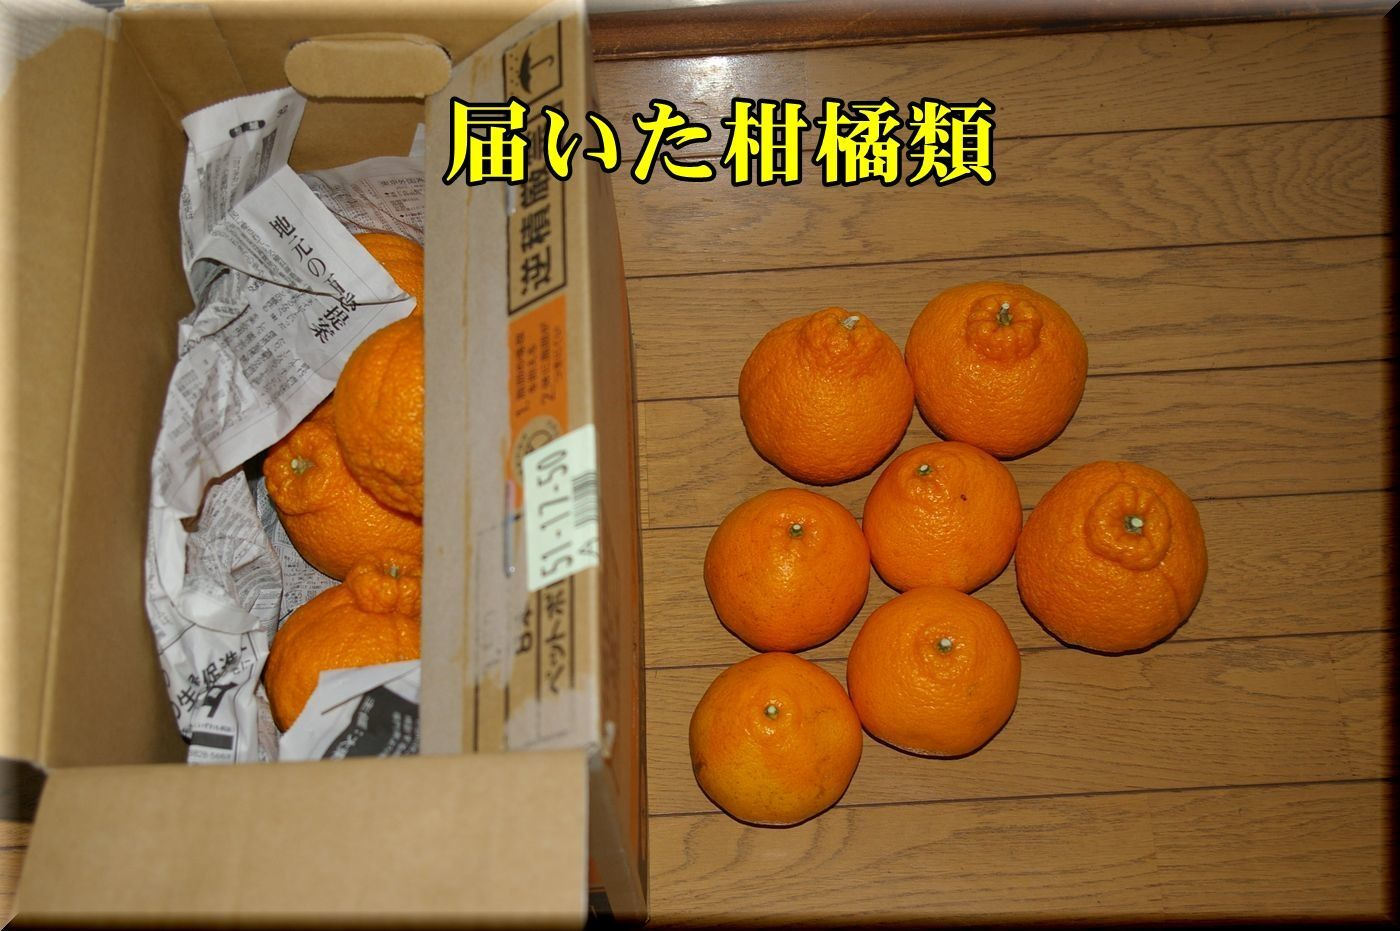 1deco170227_002.jpg